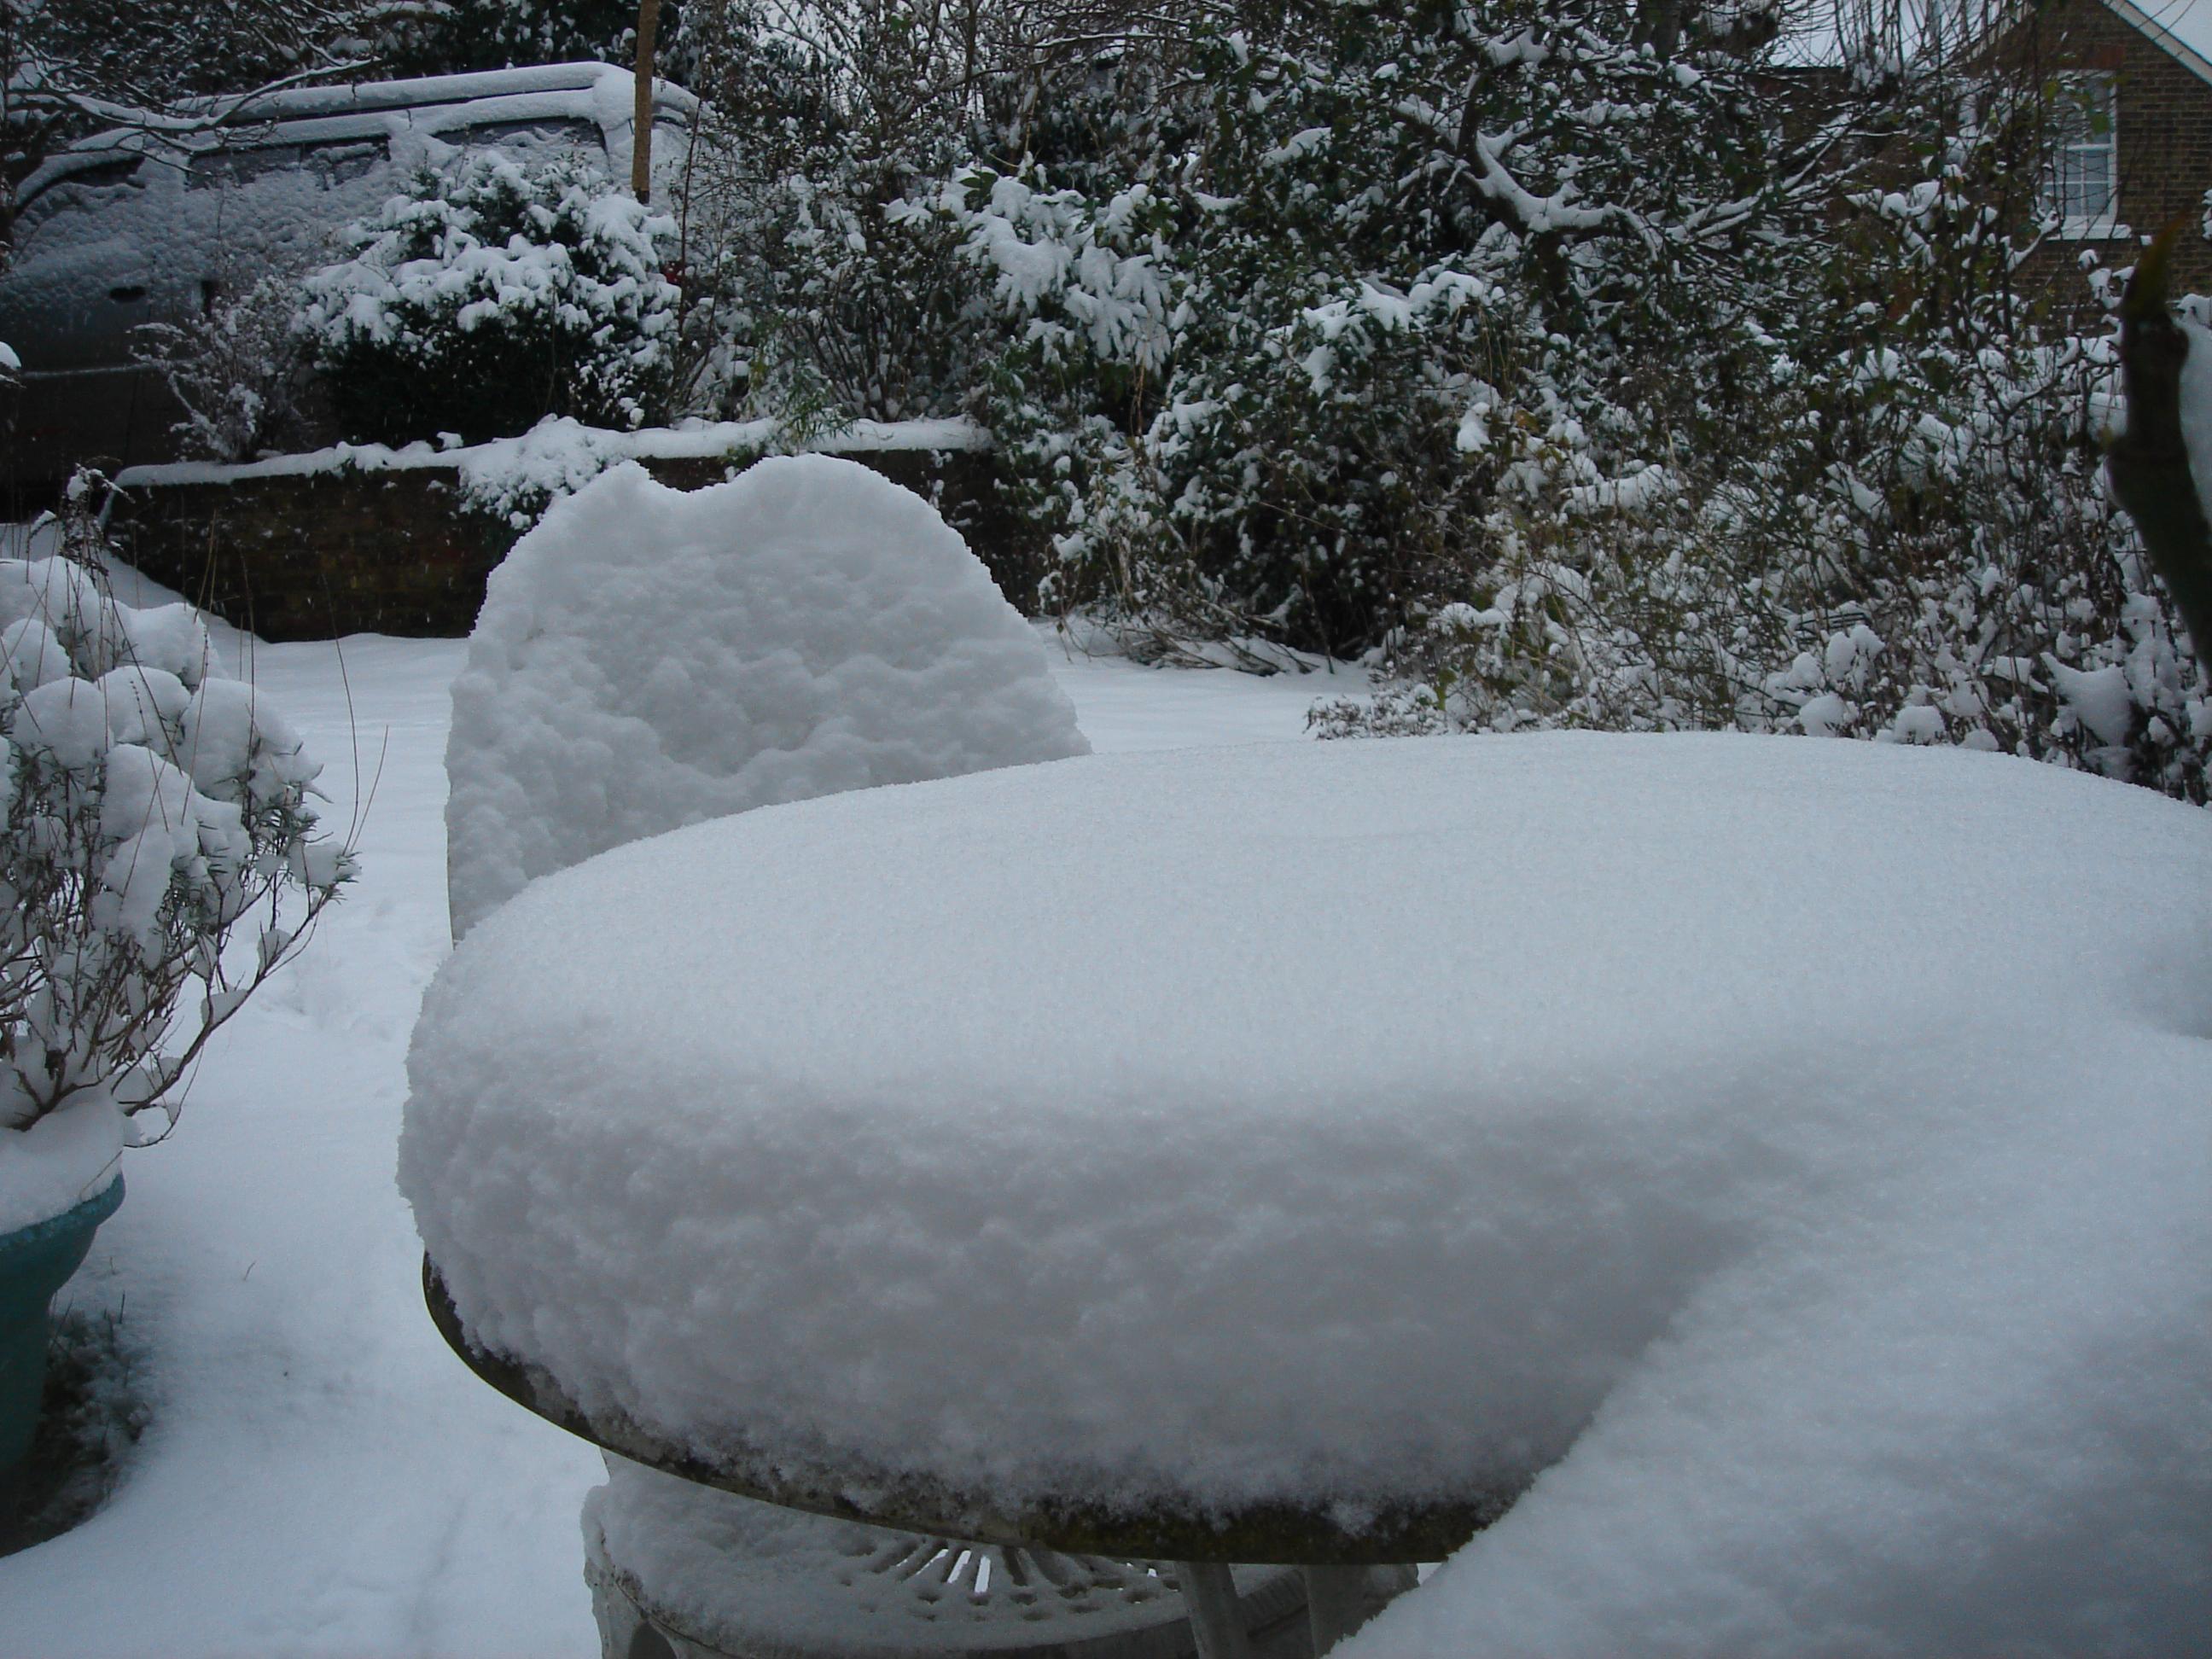 Snowy garden 3